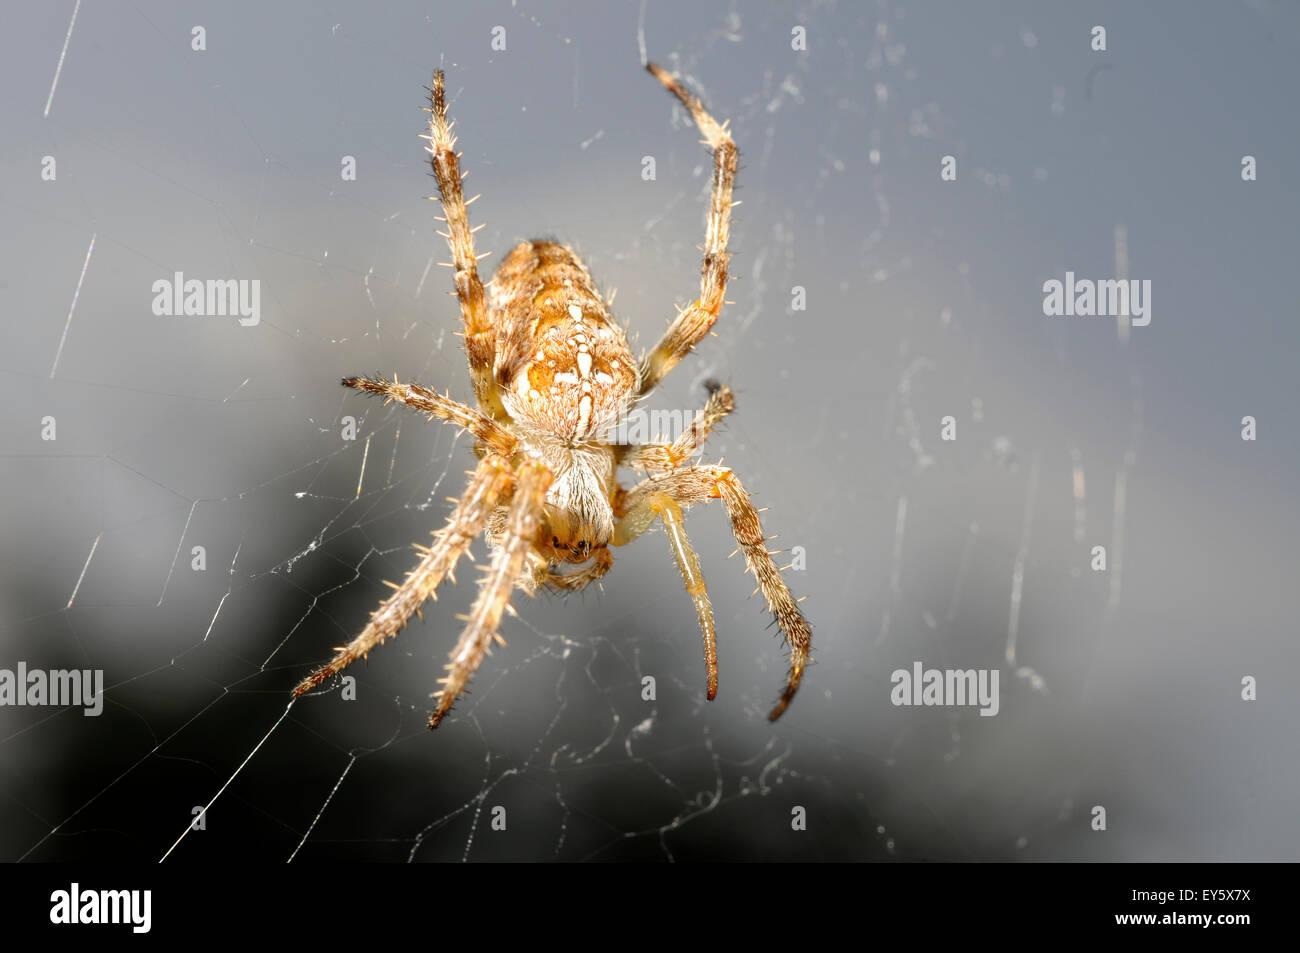 Cross orbweaver on its web - France - Stock Image